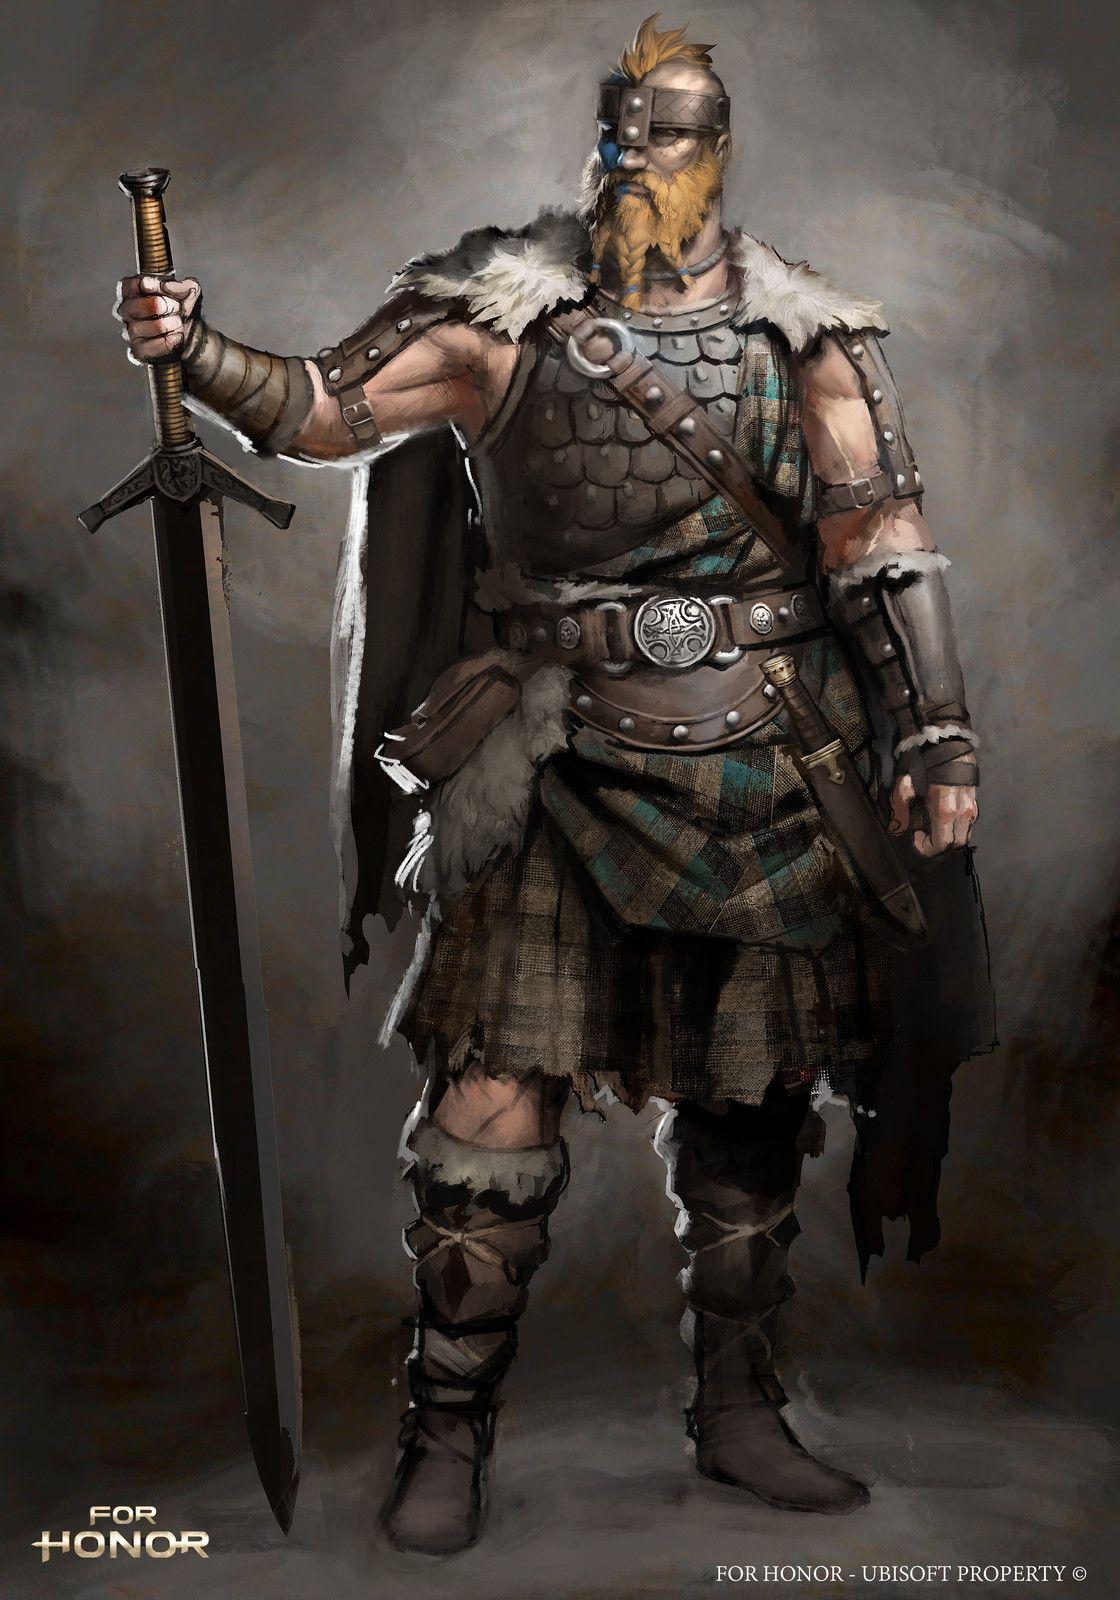 фото викингов варваров одного повстанцев